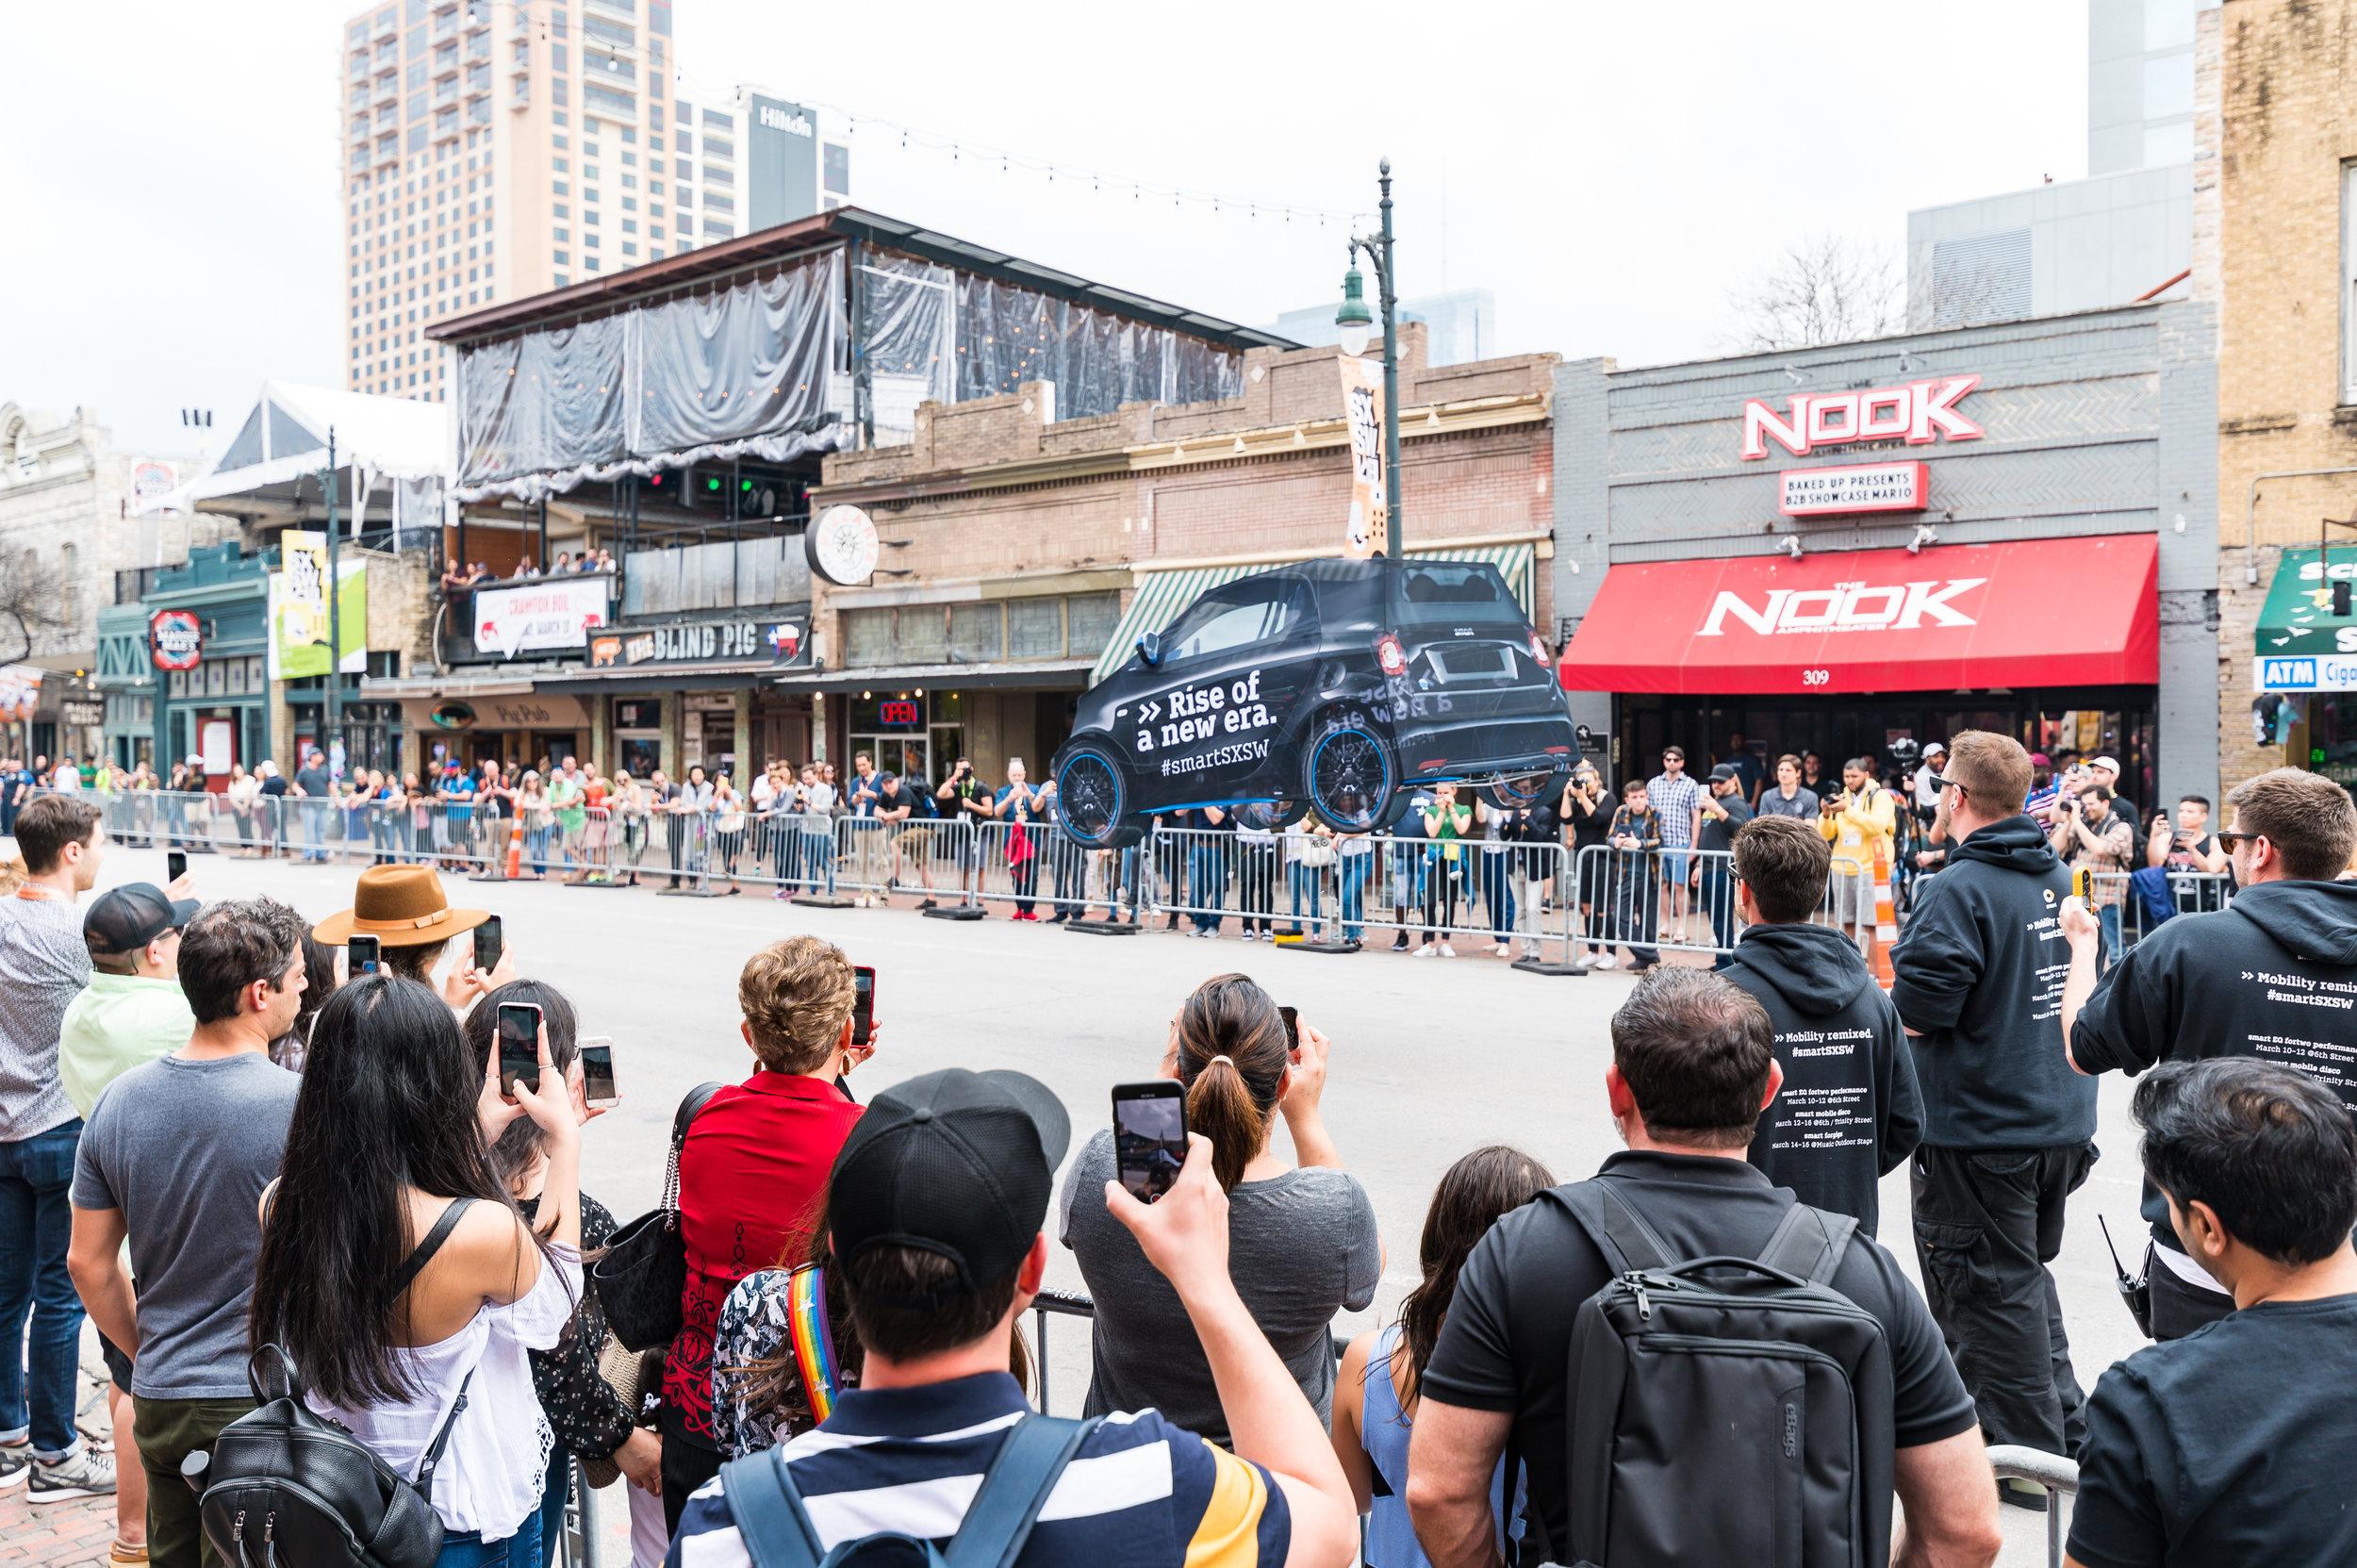 DAIMLER | SXSW RISE OF A NEW ERA